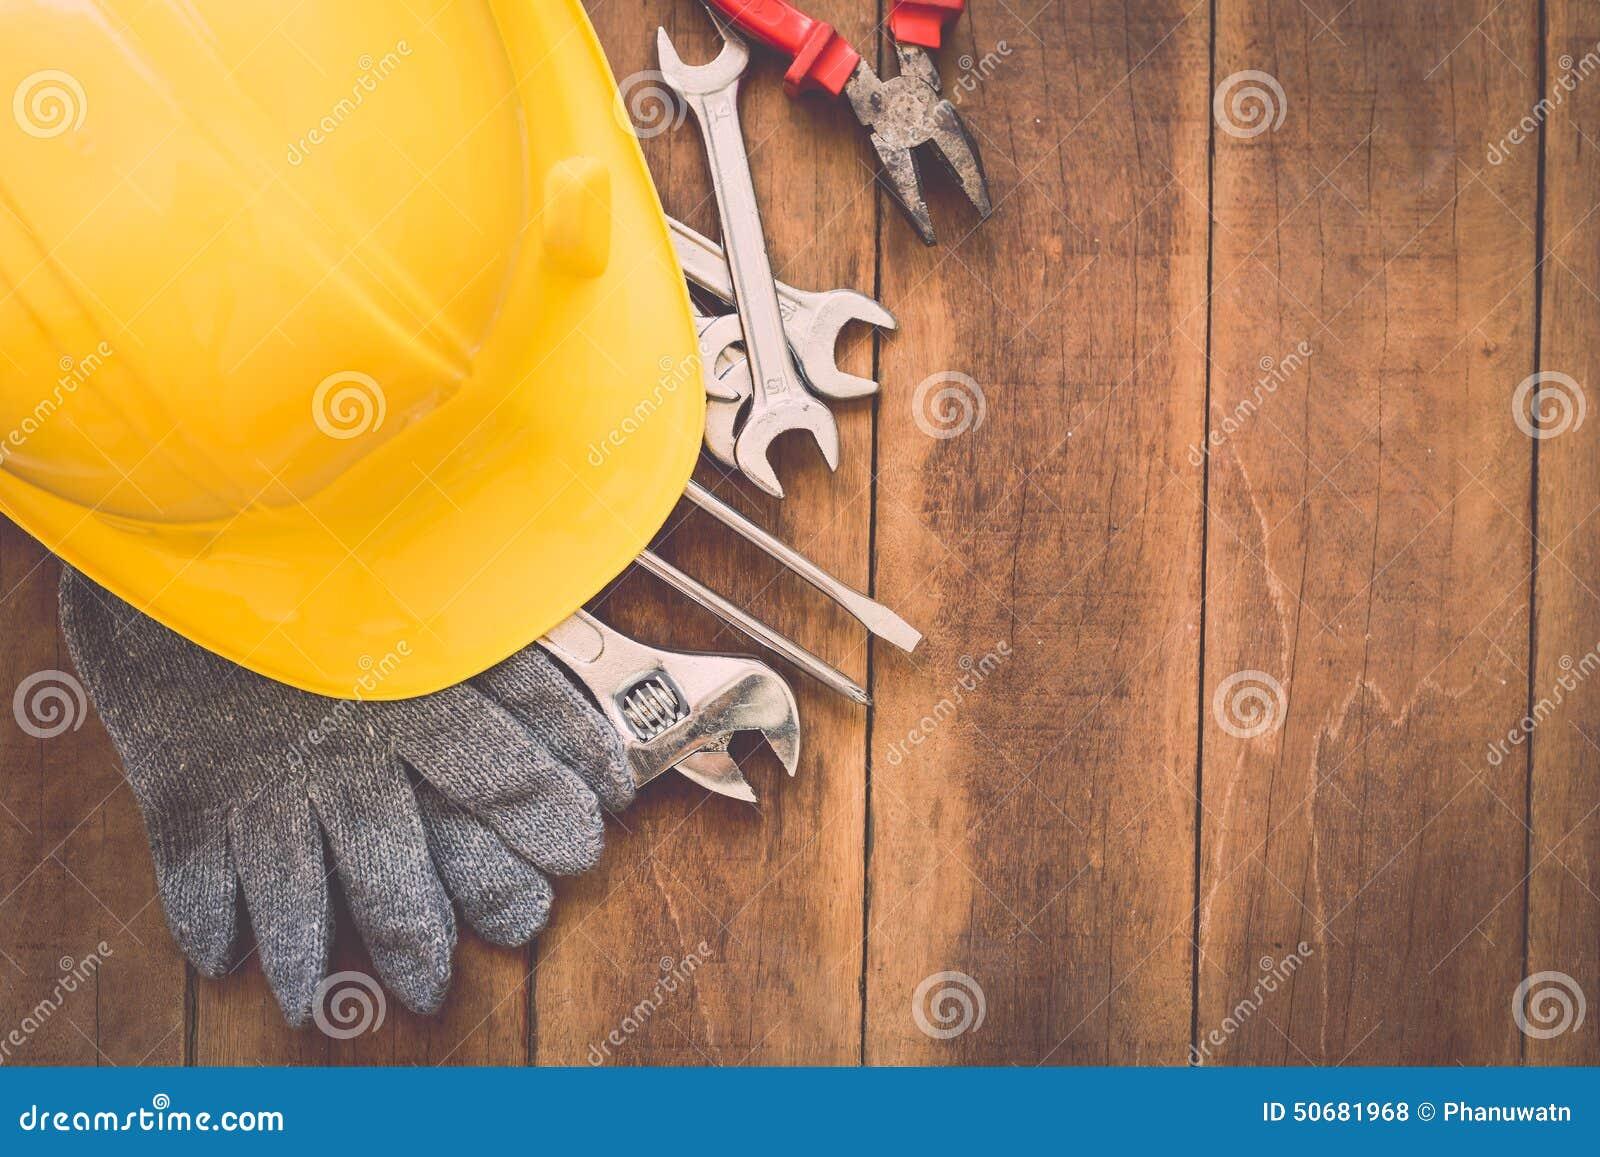 Download 在木头的被分类的工作工具 库存照片. 图片 包括有 钳子, 楼层, 概念, 木匠业, 油漆, 投反对票, 评定 - 50681968